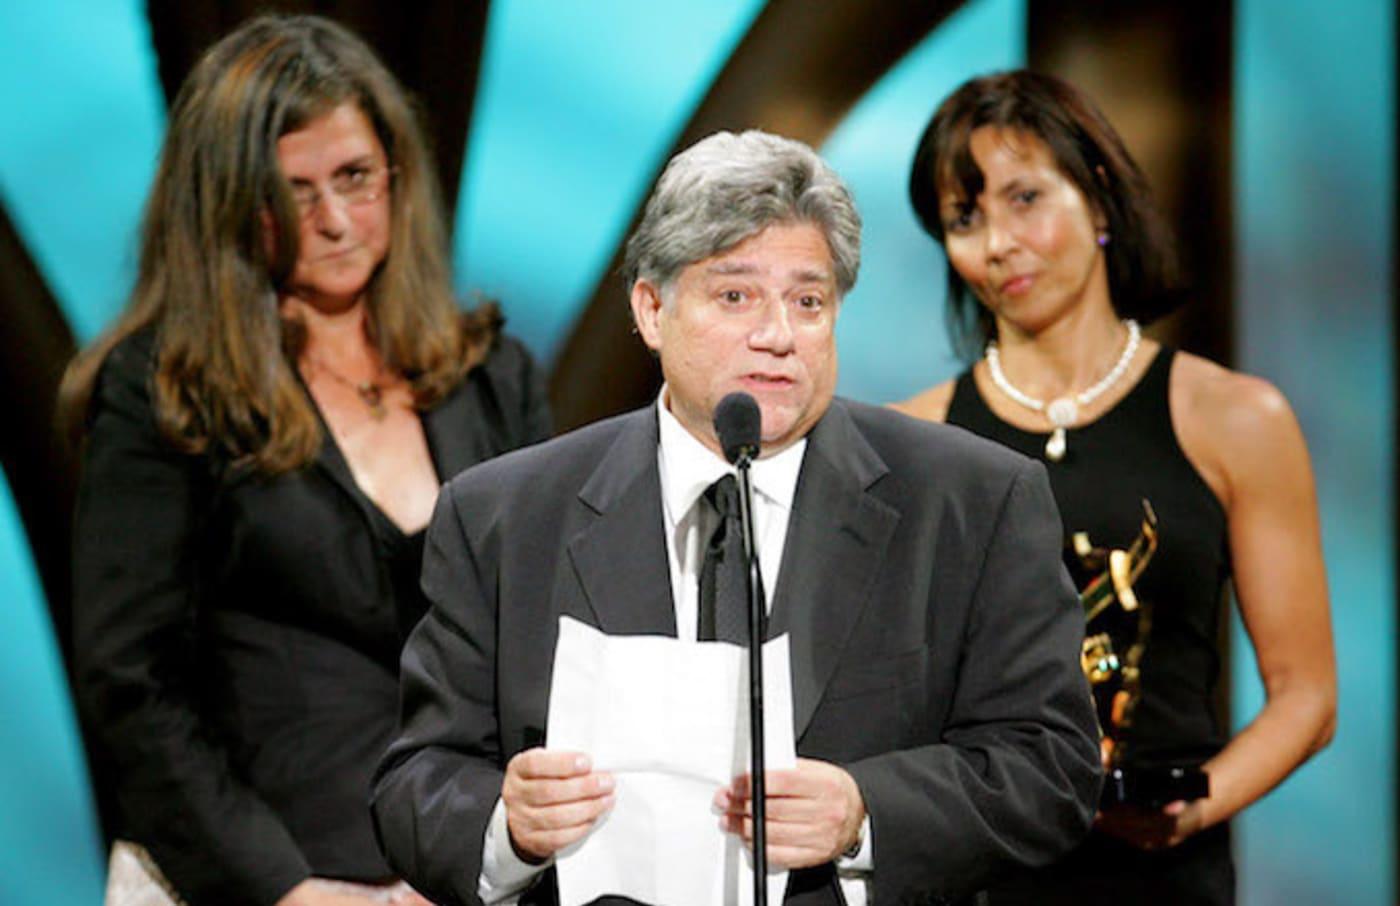 Vincent Cirrincione, Executive Producer